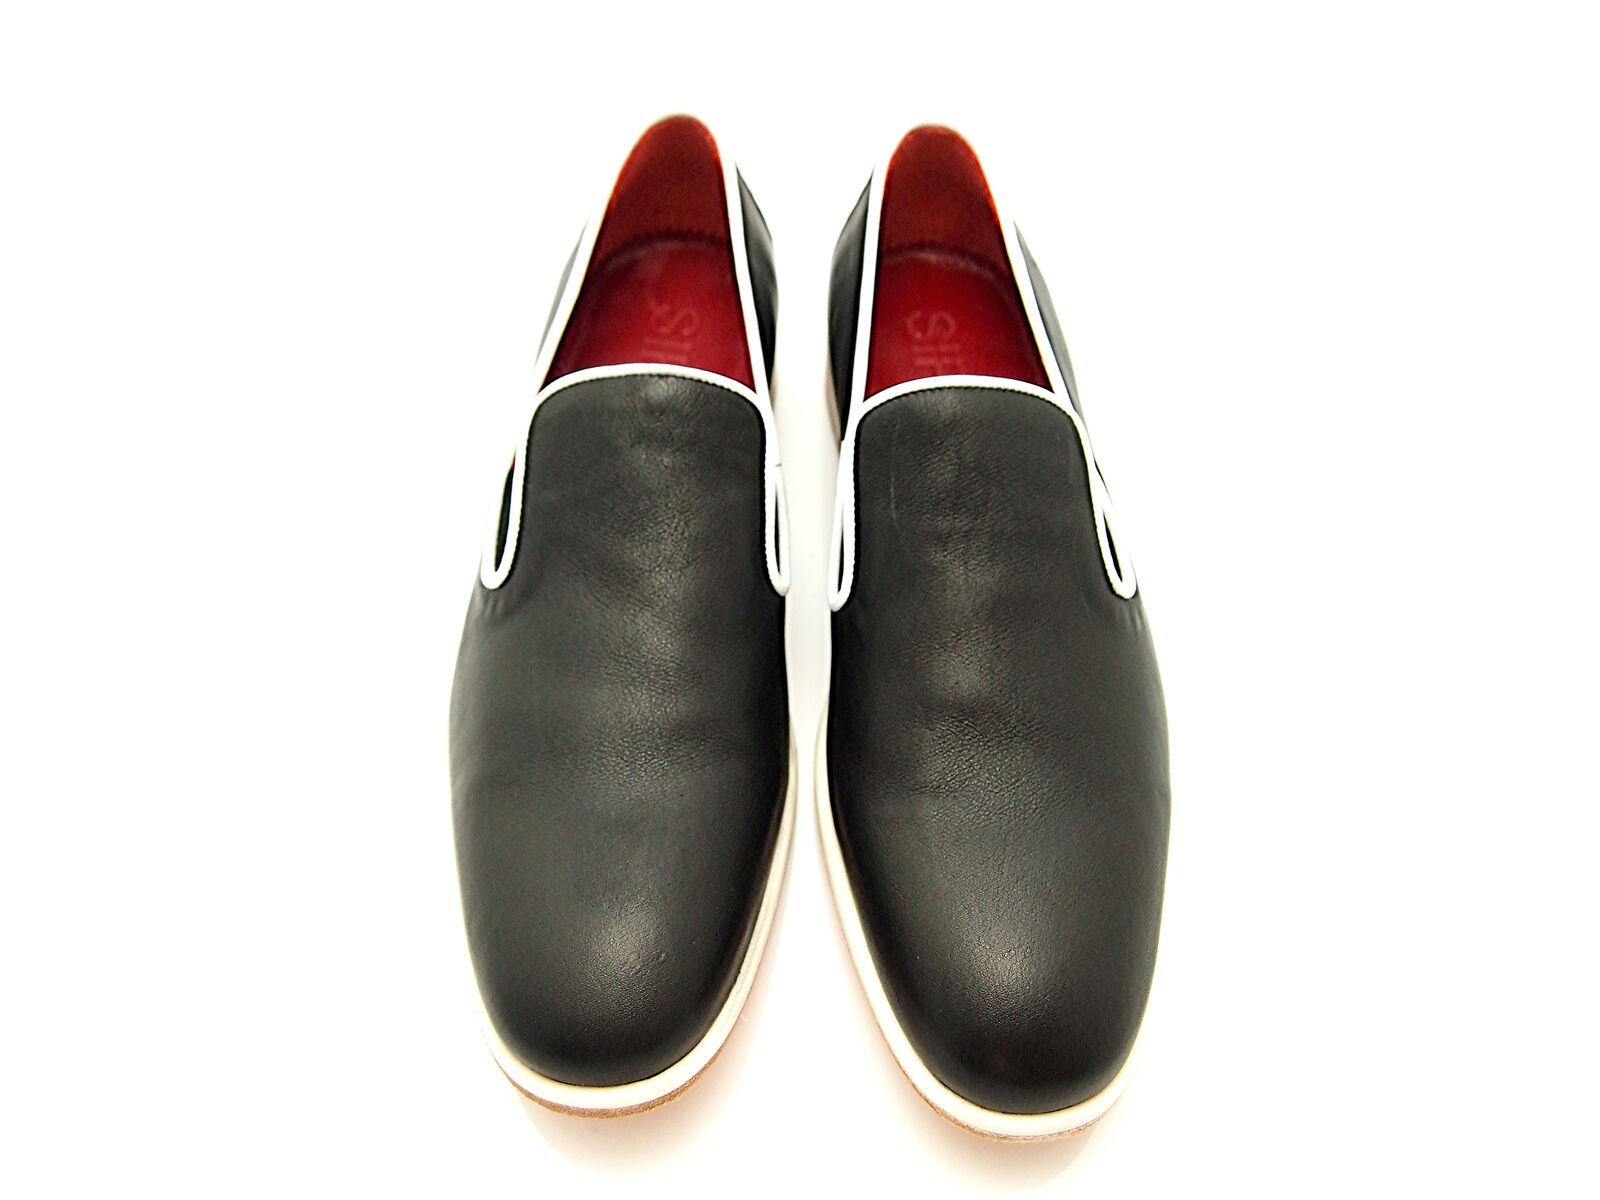 CRUZ by SIR Handmade Italian Leather Dress shoes Loafers